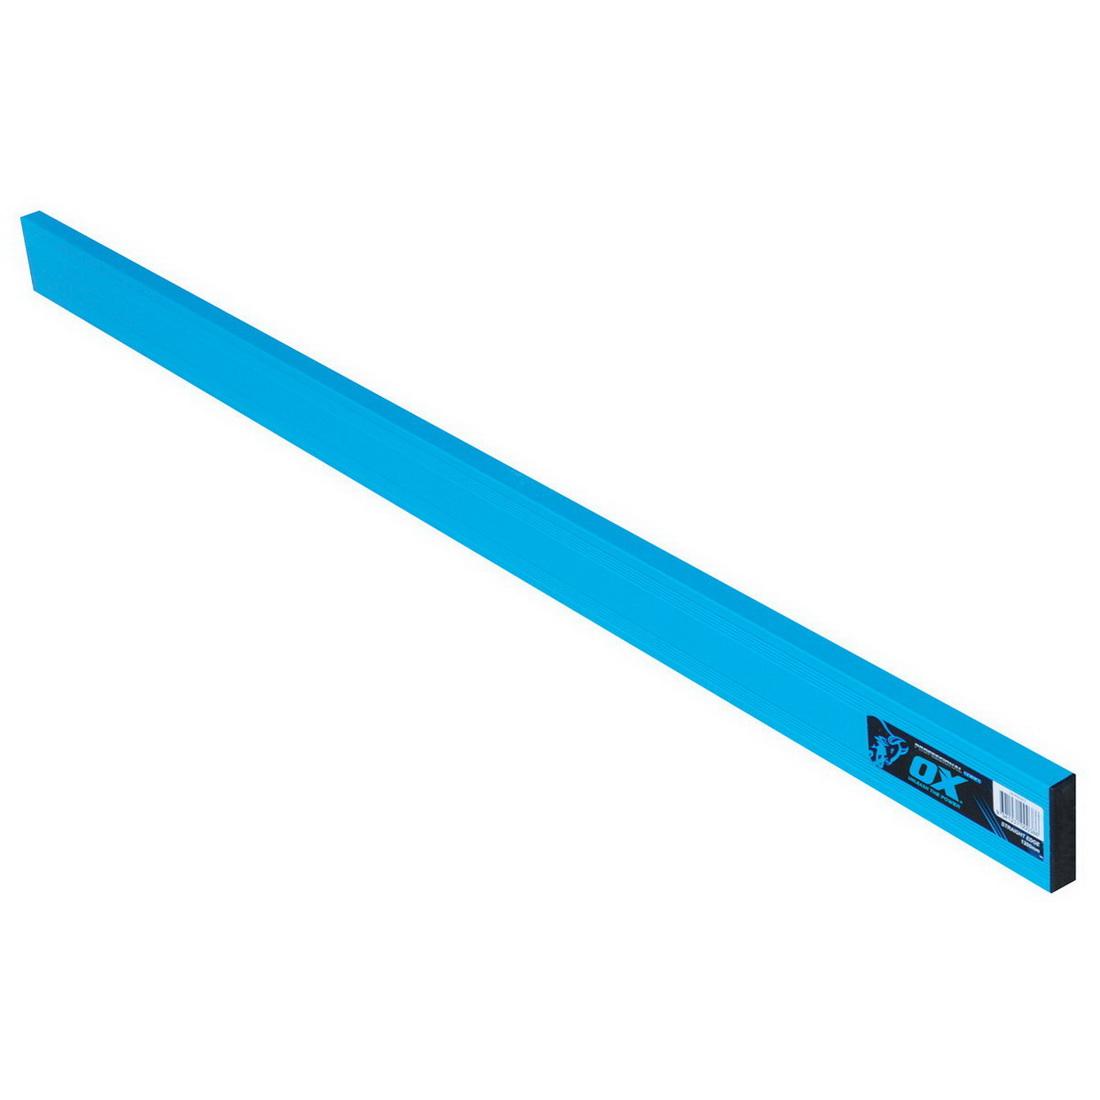 Professional Series Standard Straight Edge 2100mm Aluminium -P021621